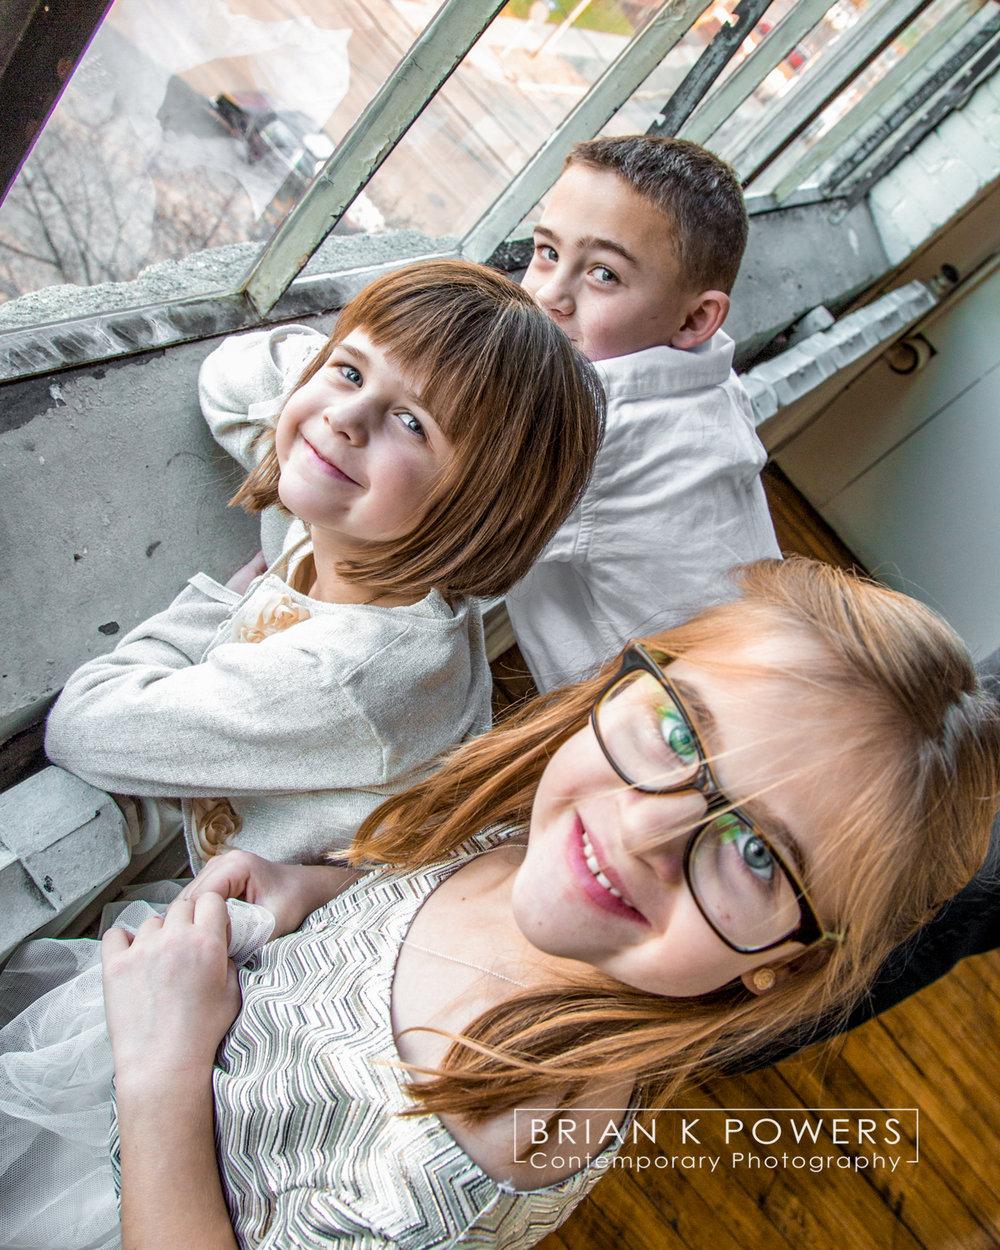 Portrait-Website McBride-Family_portrait_with_children-001.jpg